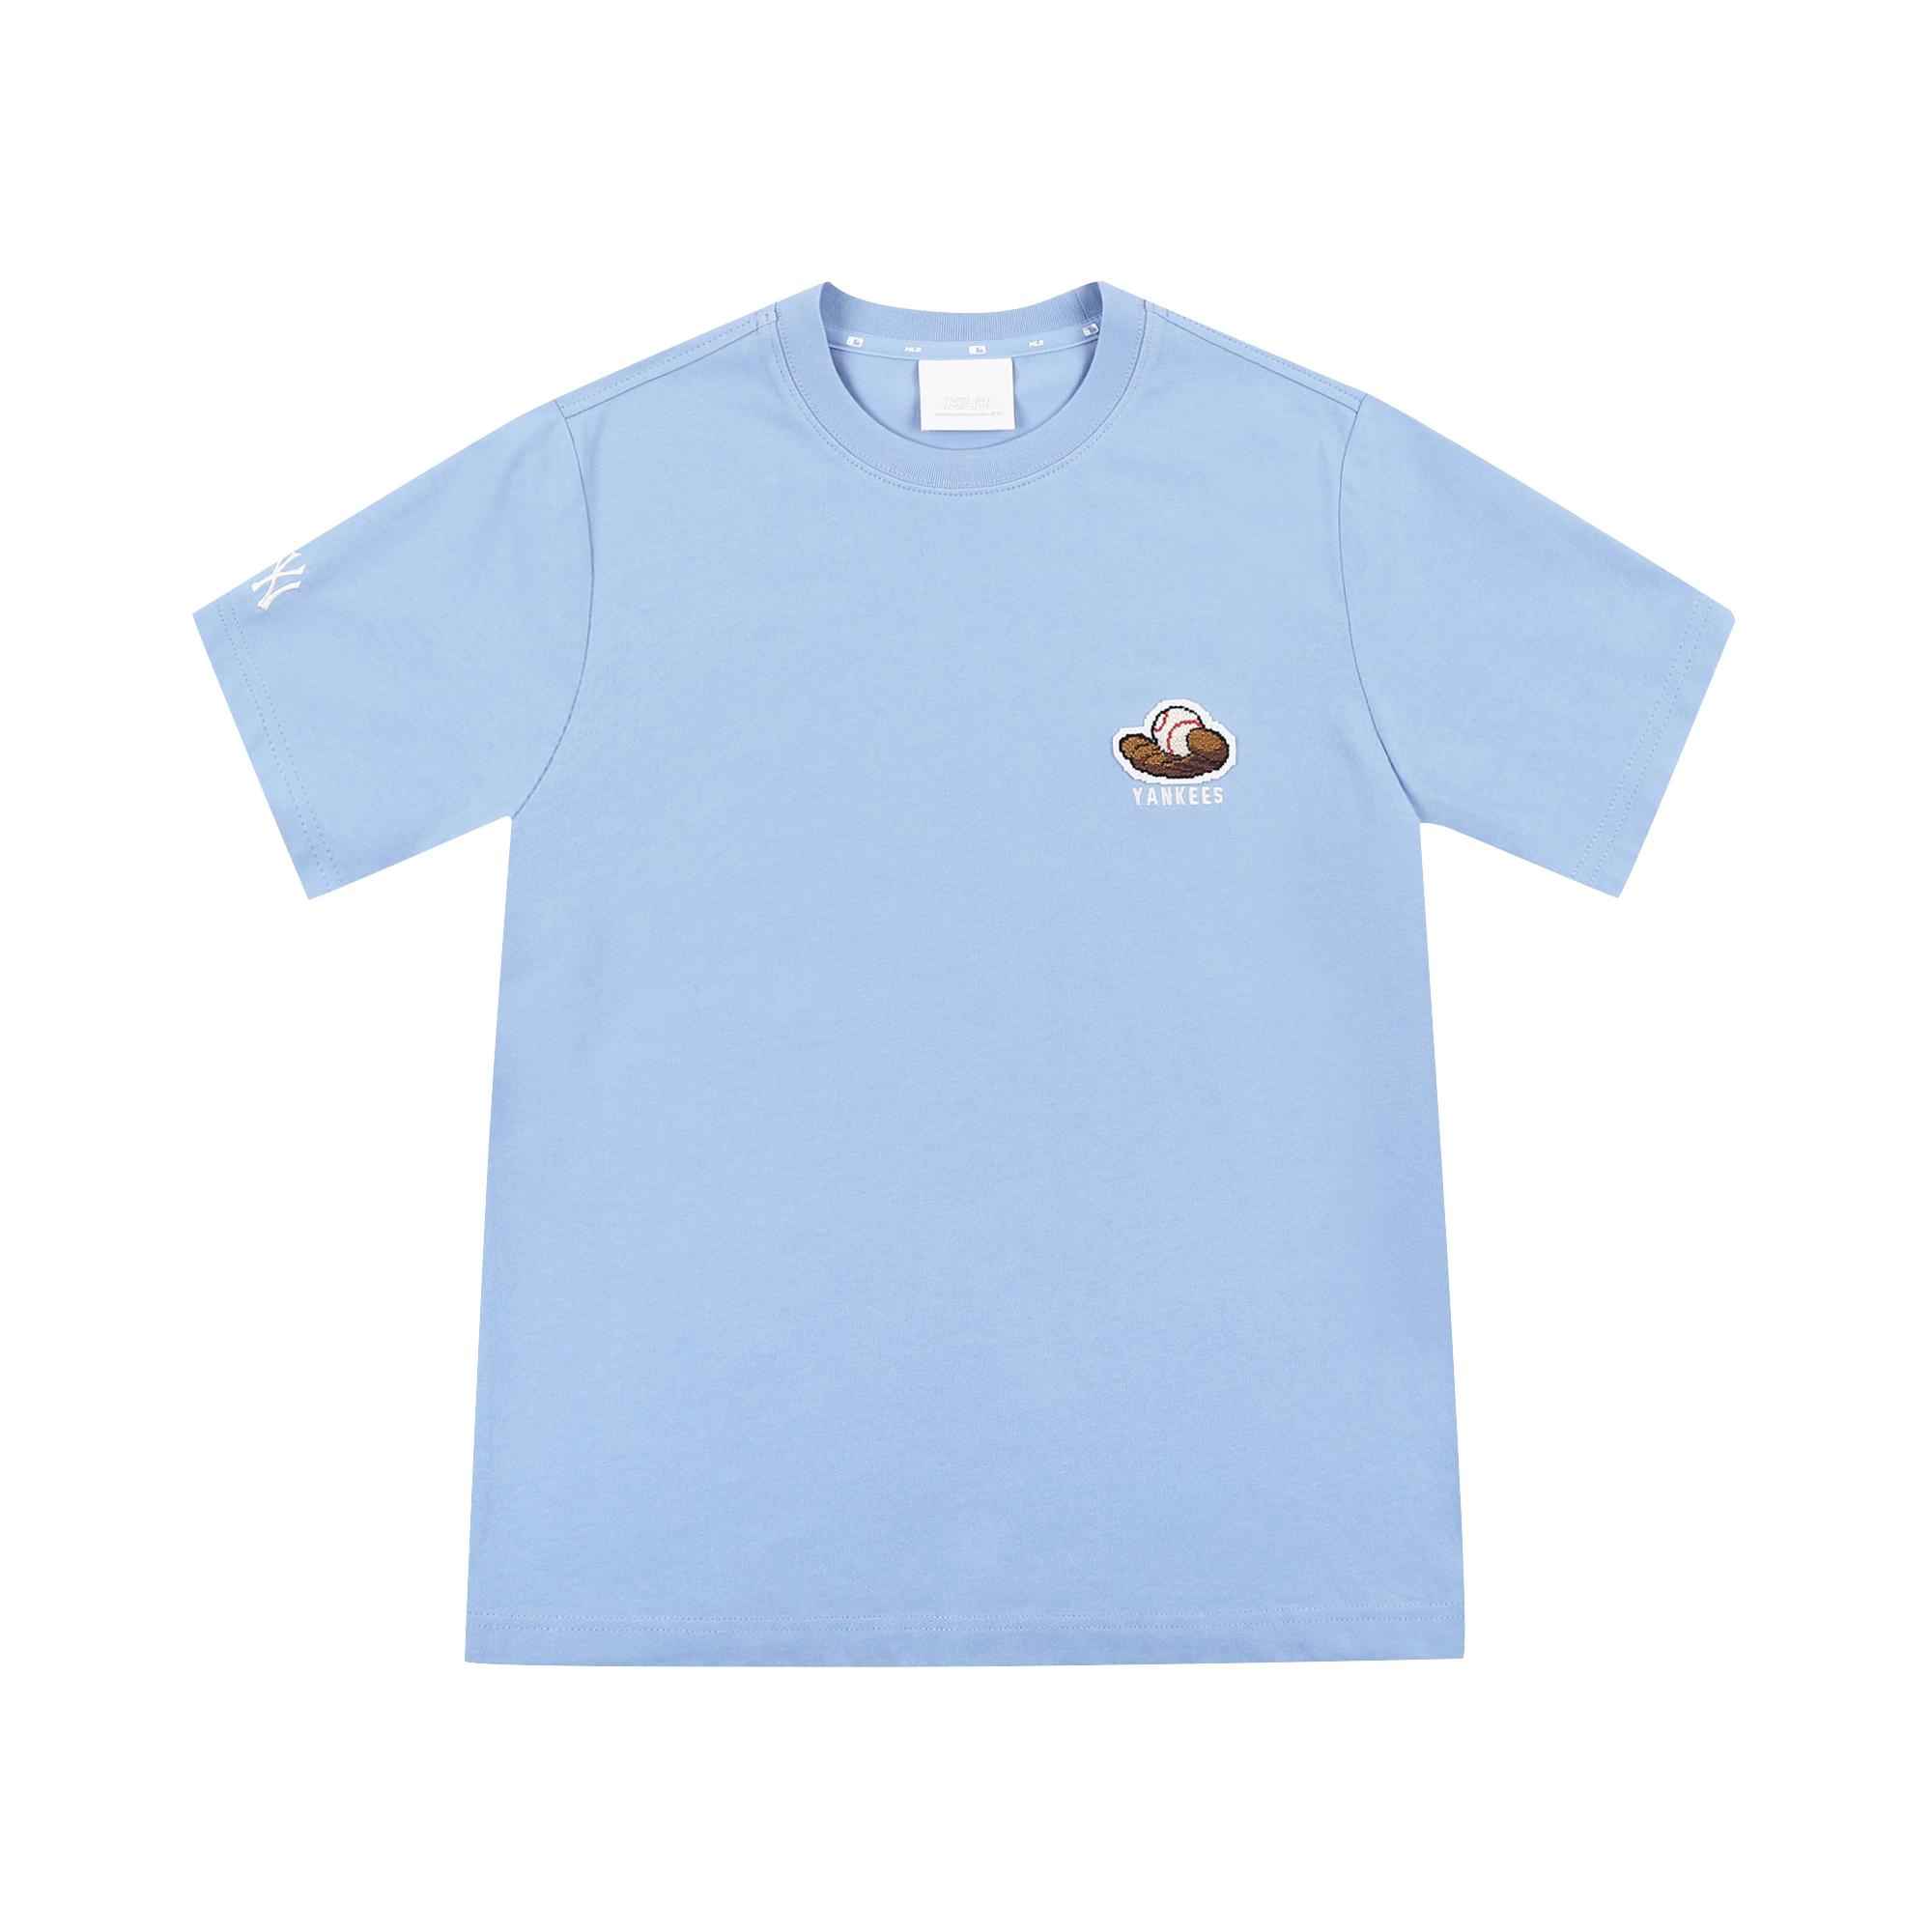 PLAY 반팔 티셔츠 뉴욕양키스